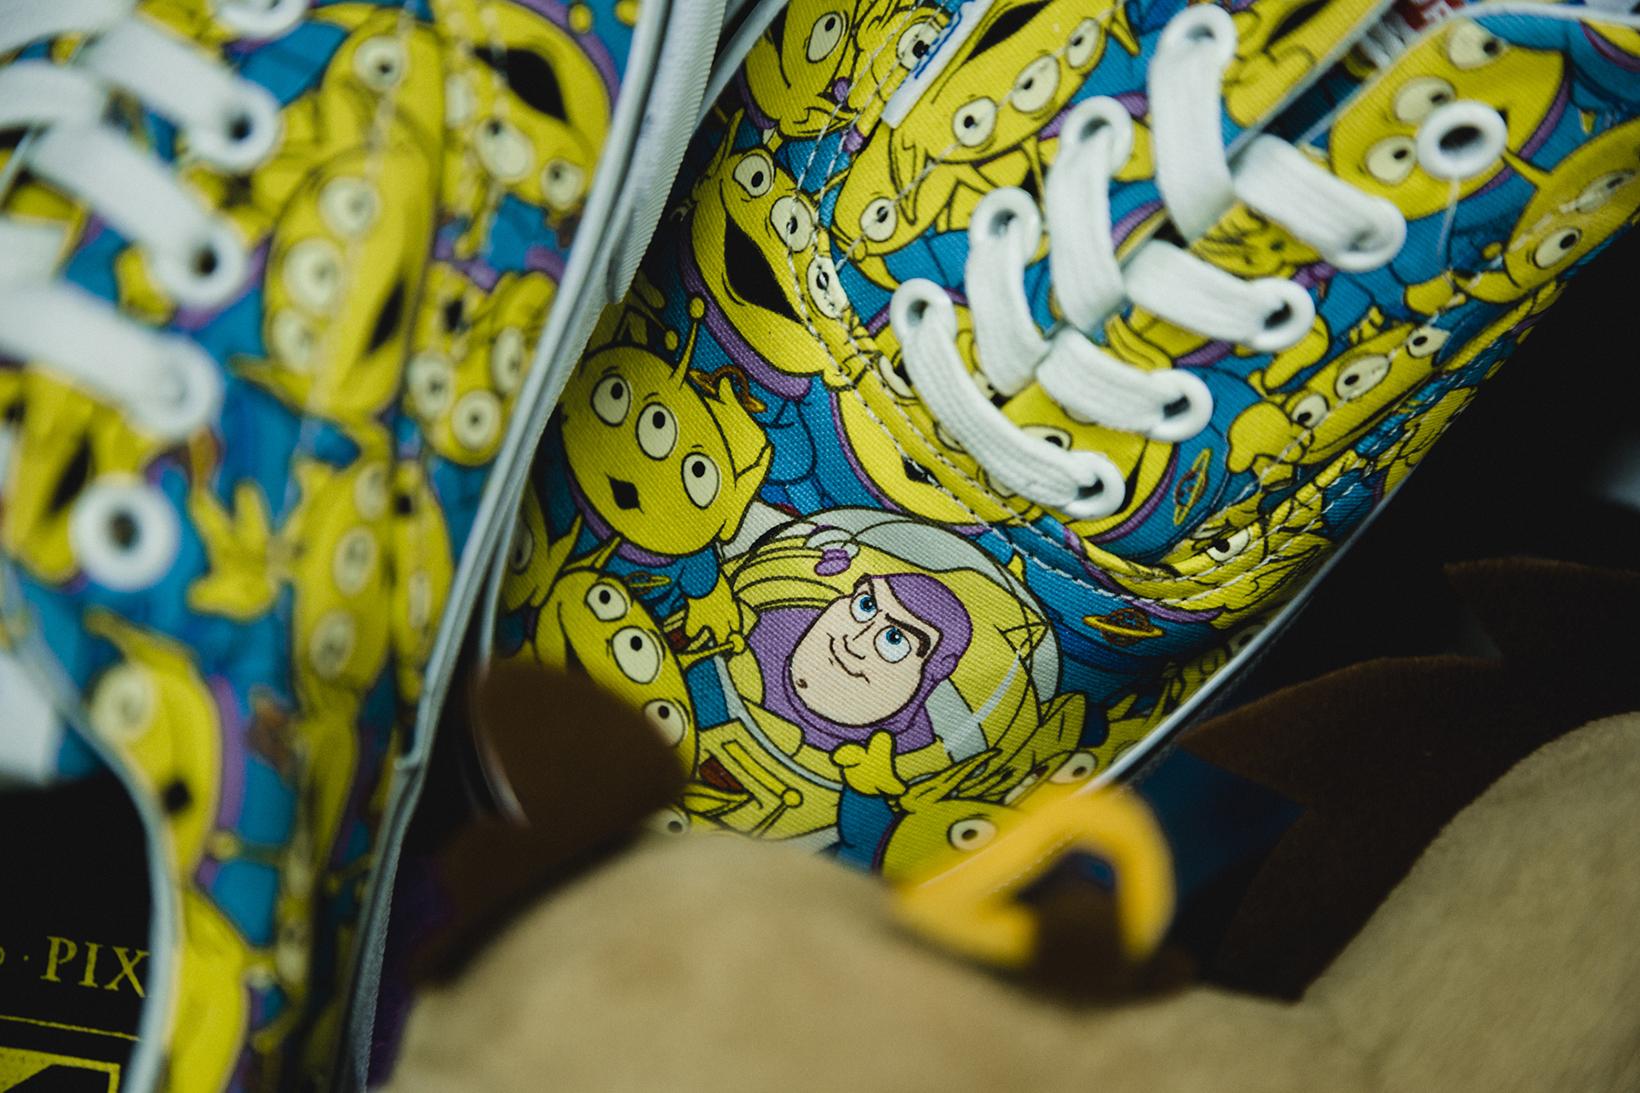 Toy Story Vans Sneakers Woody Buzz Lightyear Disney - 1765025